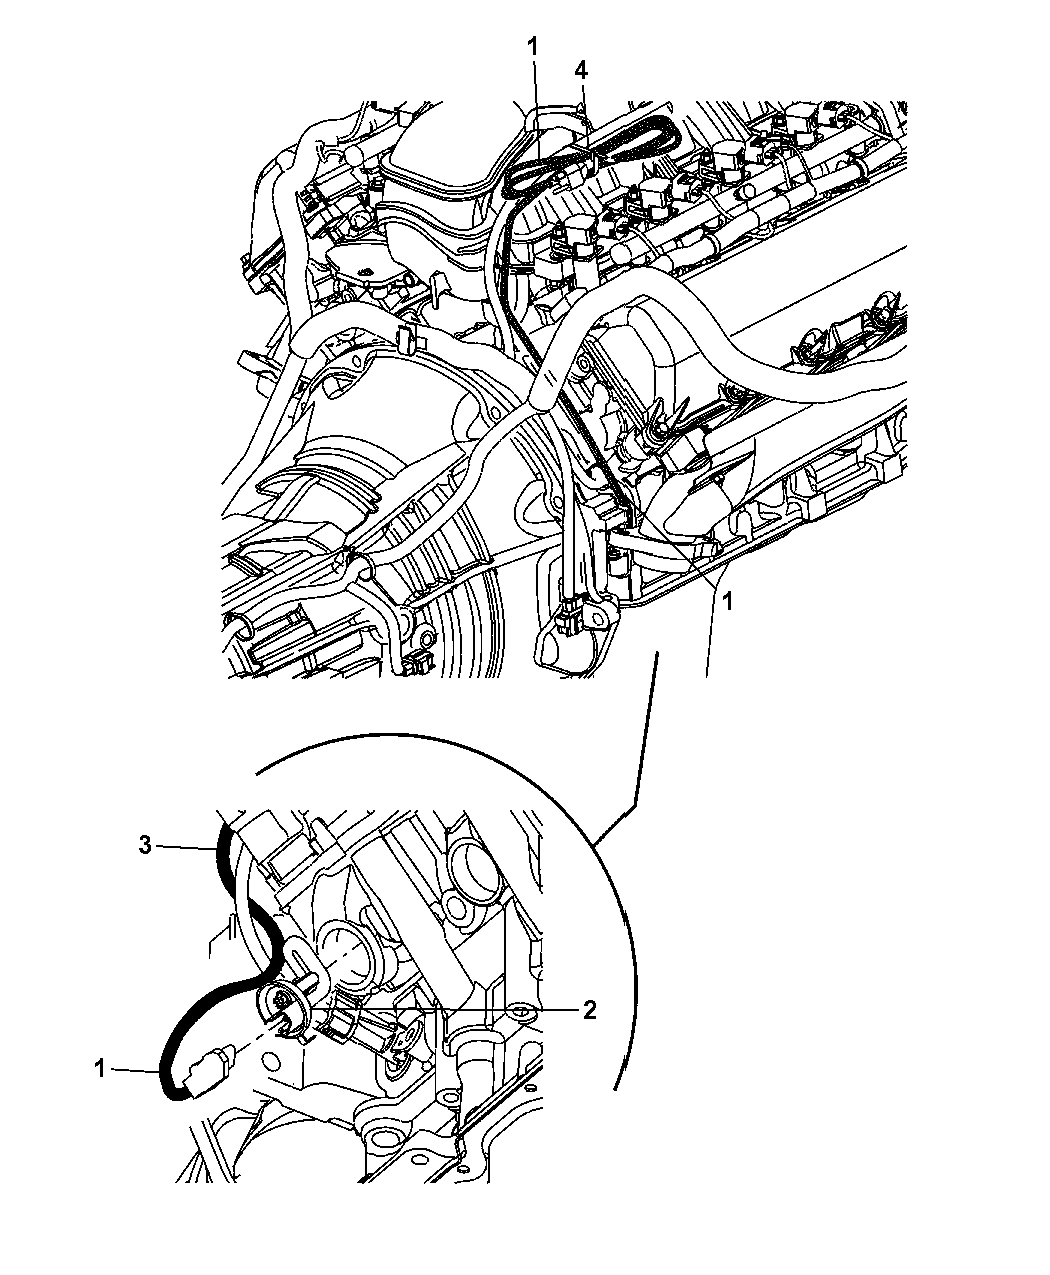 2009 jeep grand cherokee cylinder block heater - thumbnail 1